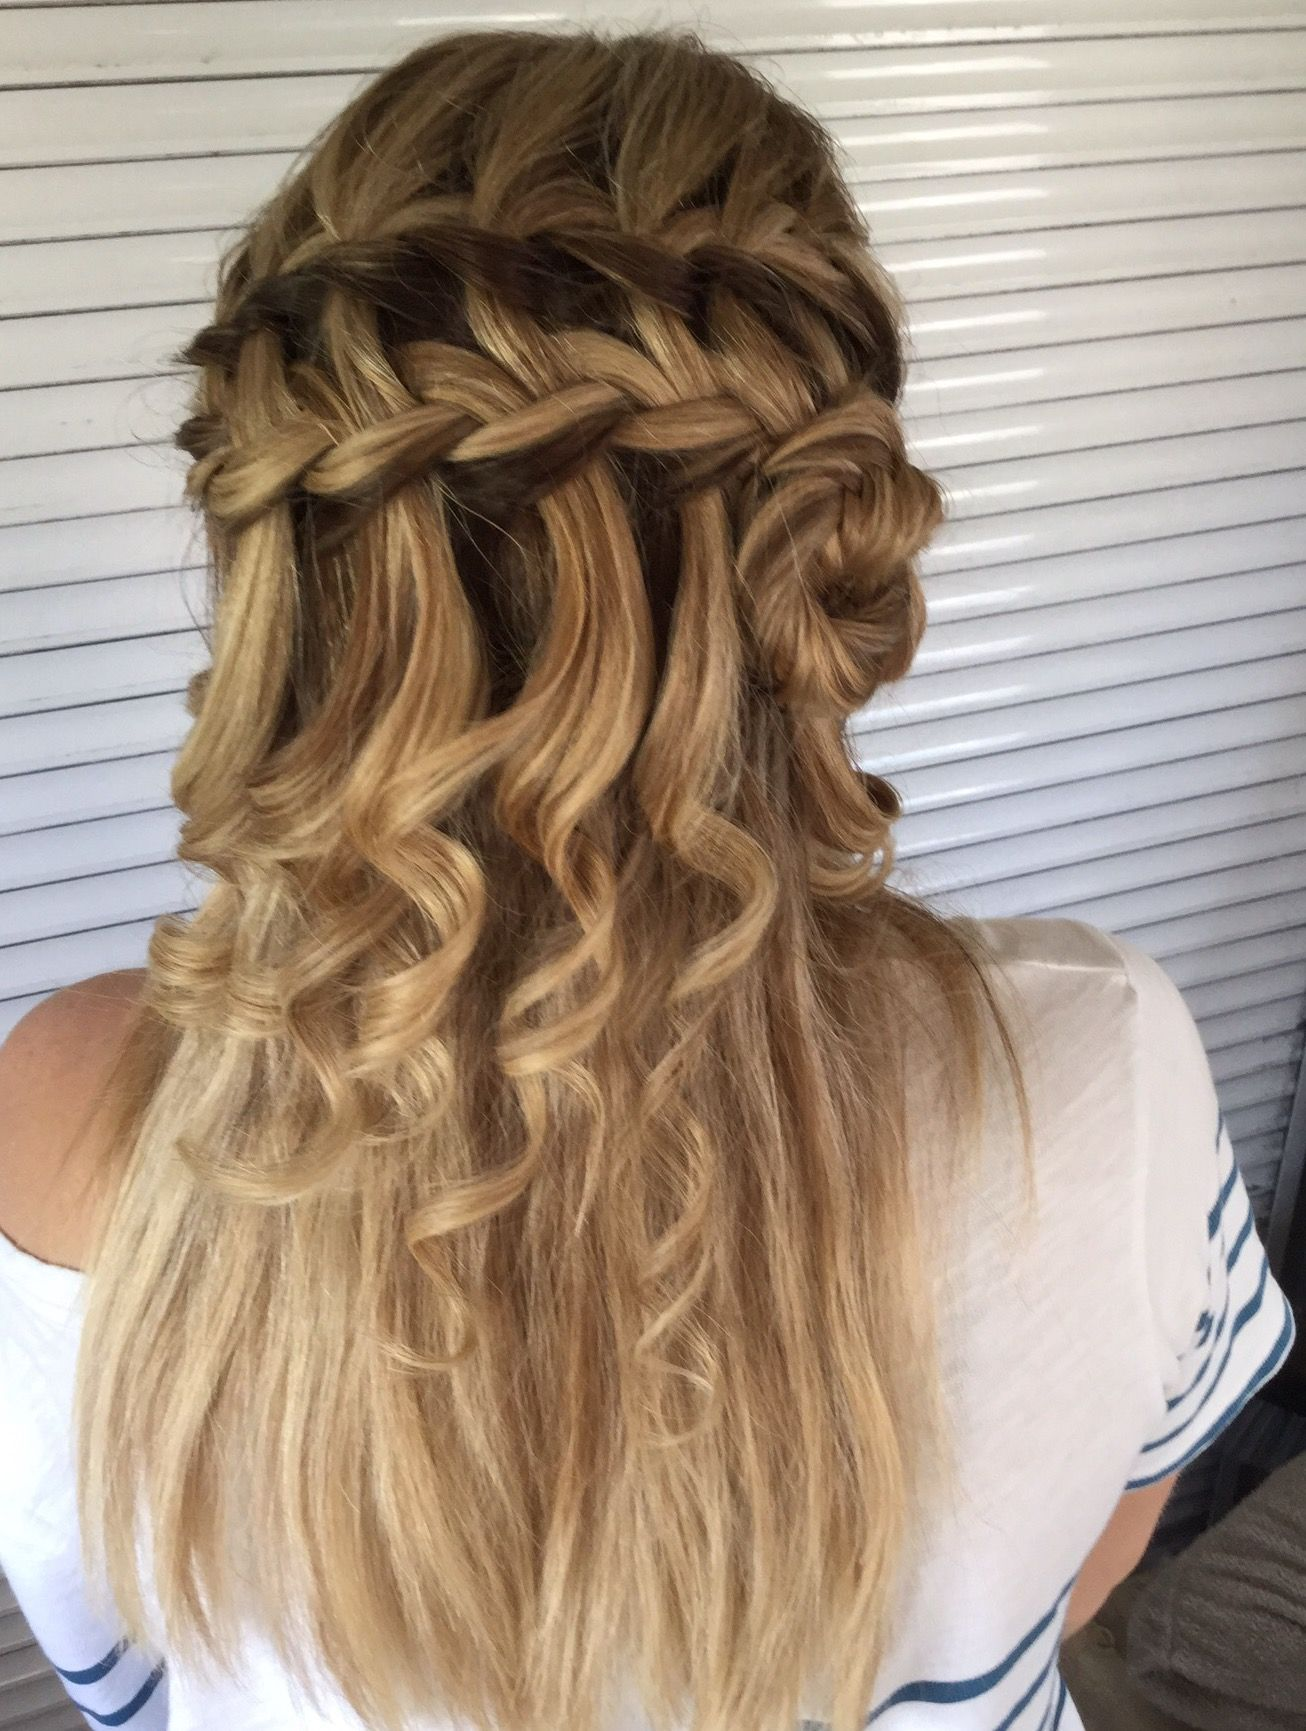 curled waterfall braid. #curls #braid #waterfall #hairup | harika